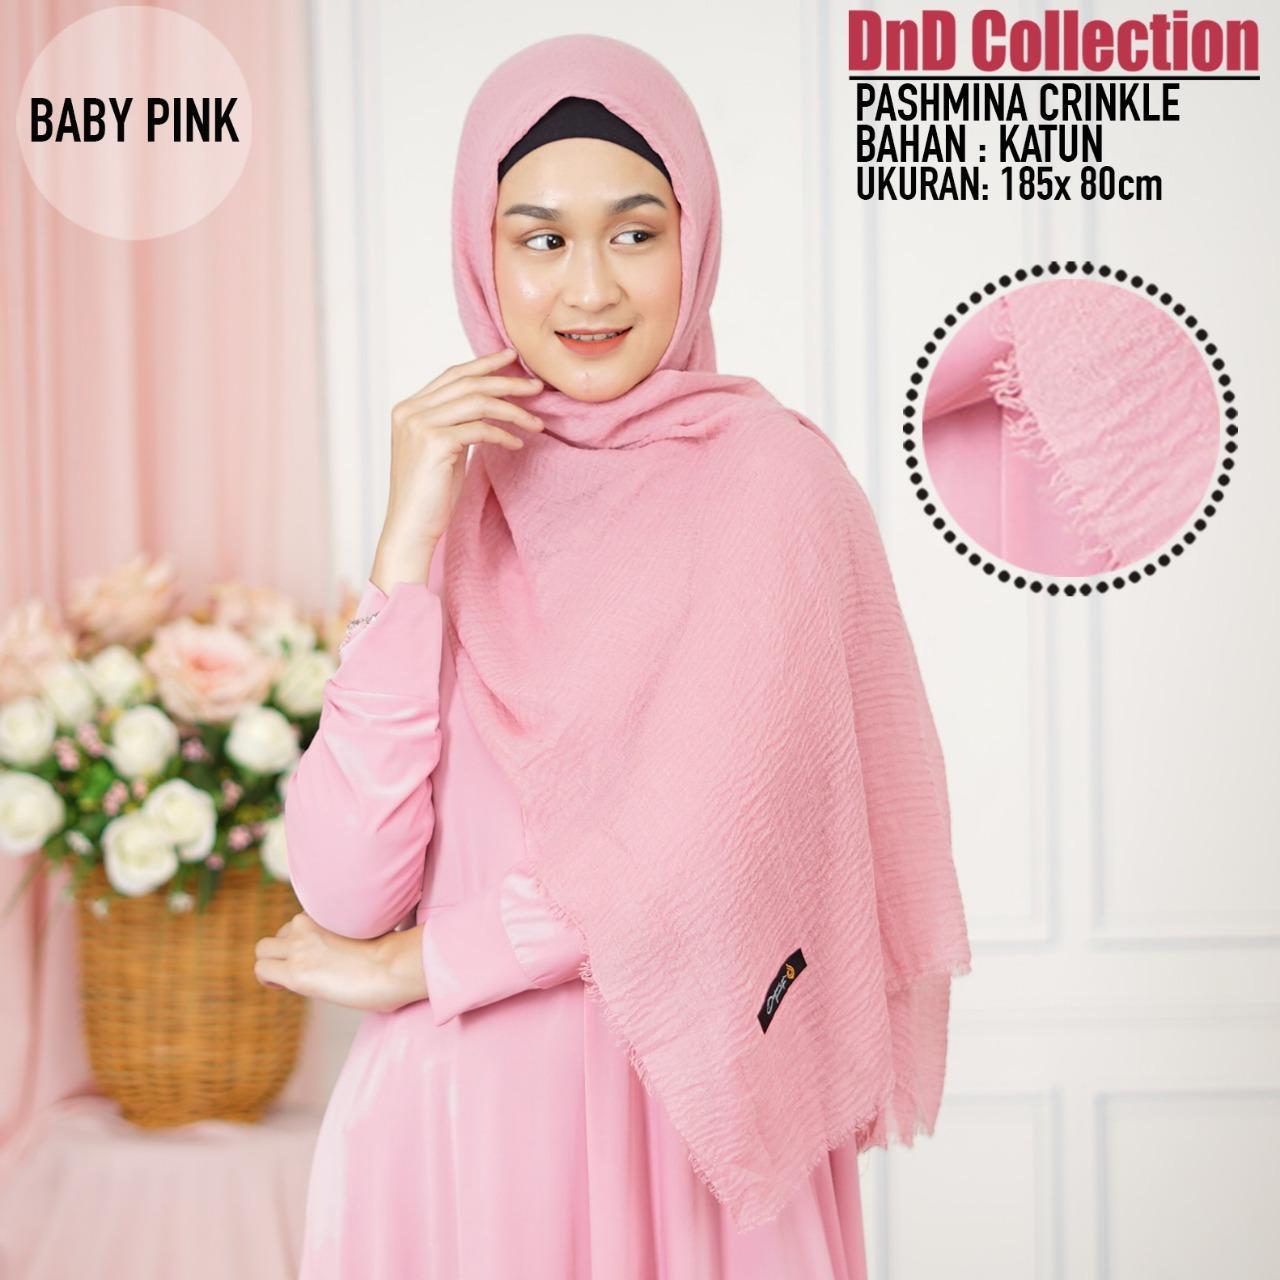 DnD-(COD) Promo Hijab Pashmina Crinkle Rawis/ Jilbab Pashmina Crinkle